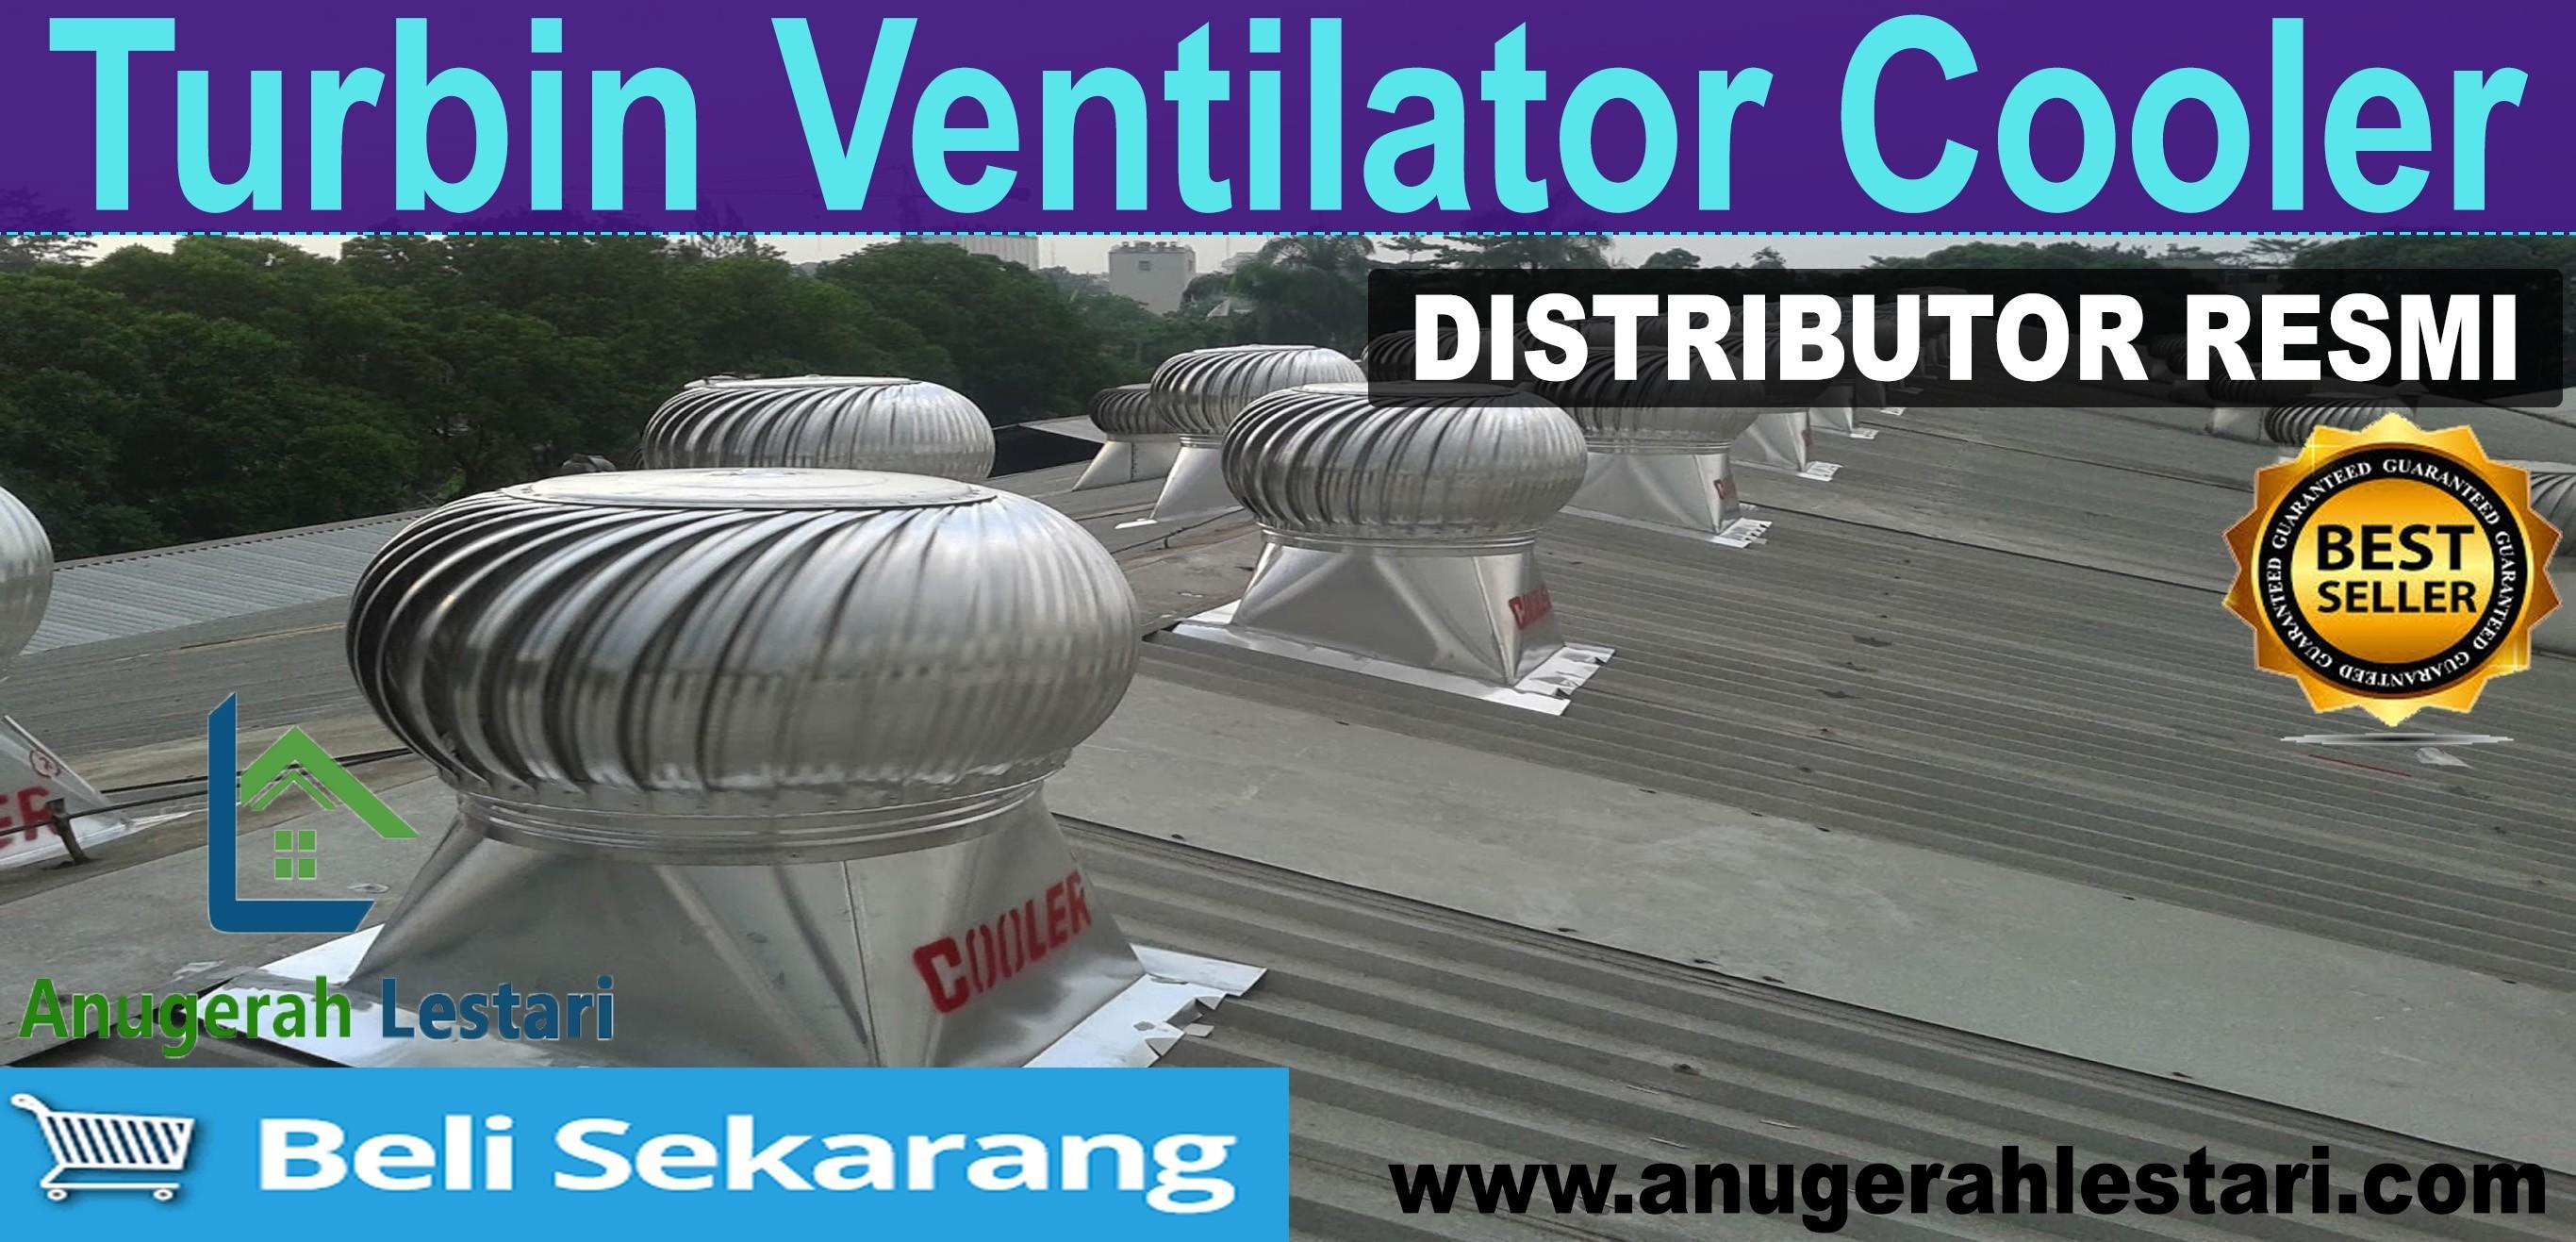 pabrik turbin ventilator